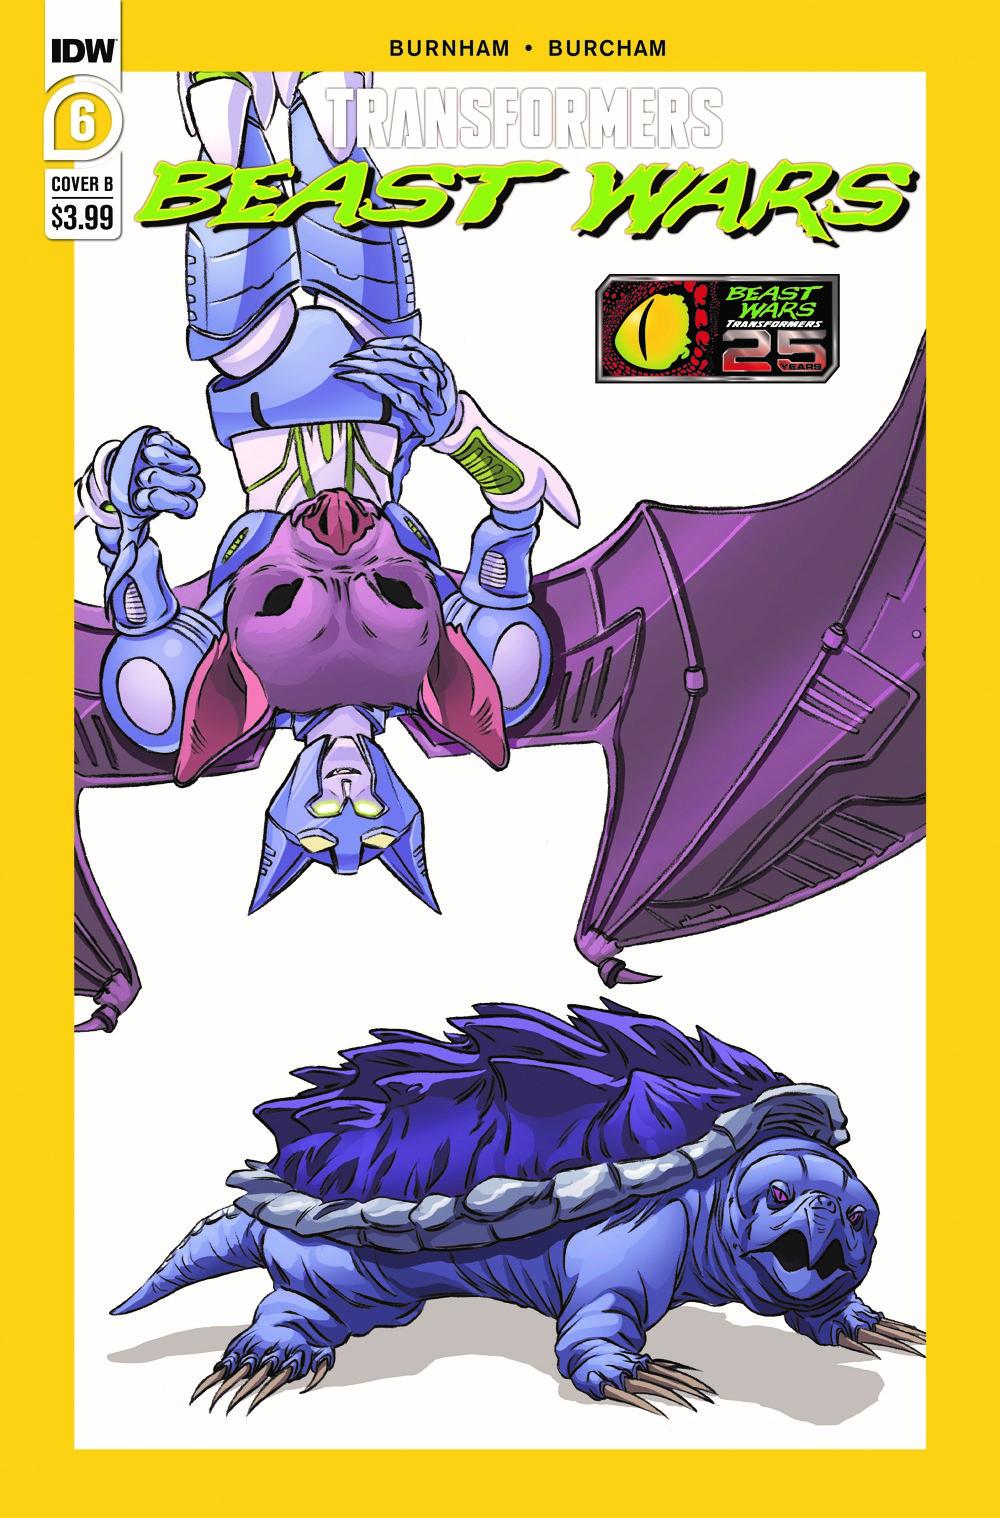 TFBW06-Cover-B ComicList Previews: TRANSFORMERS BEAST WARS #6